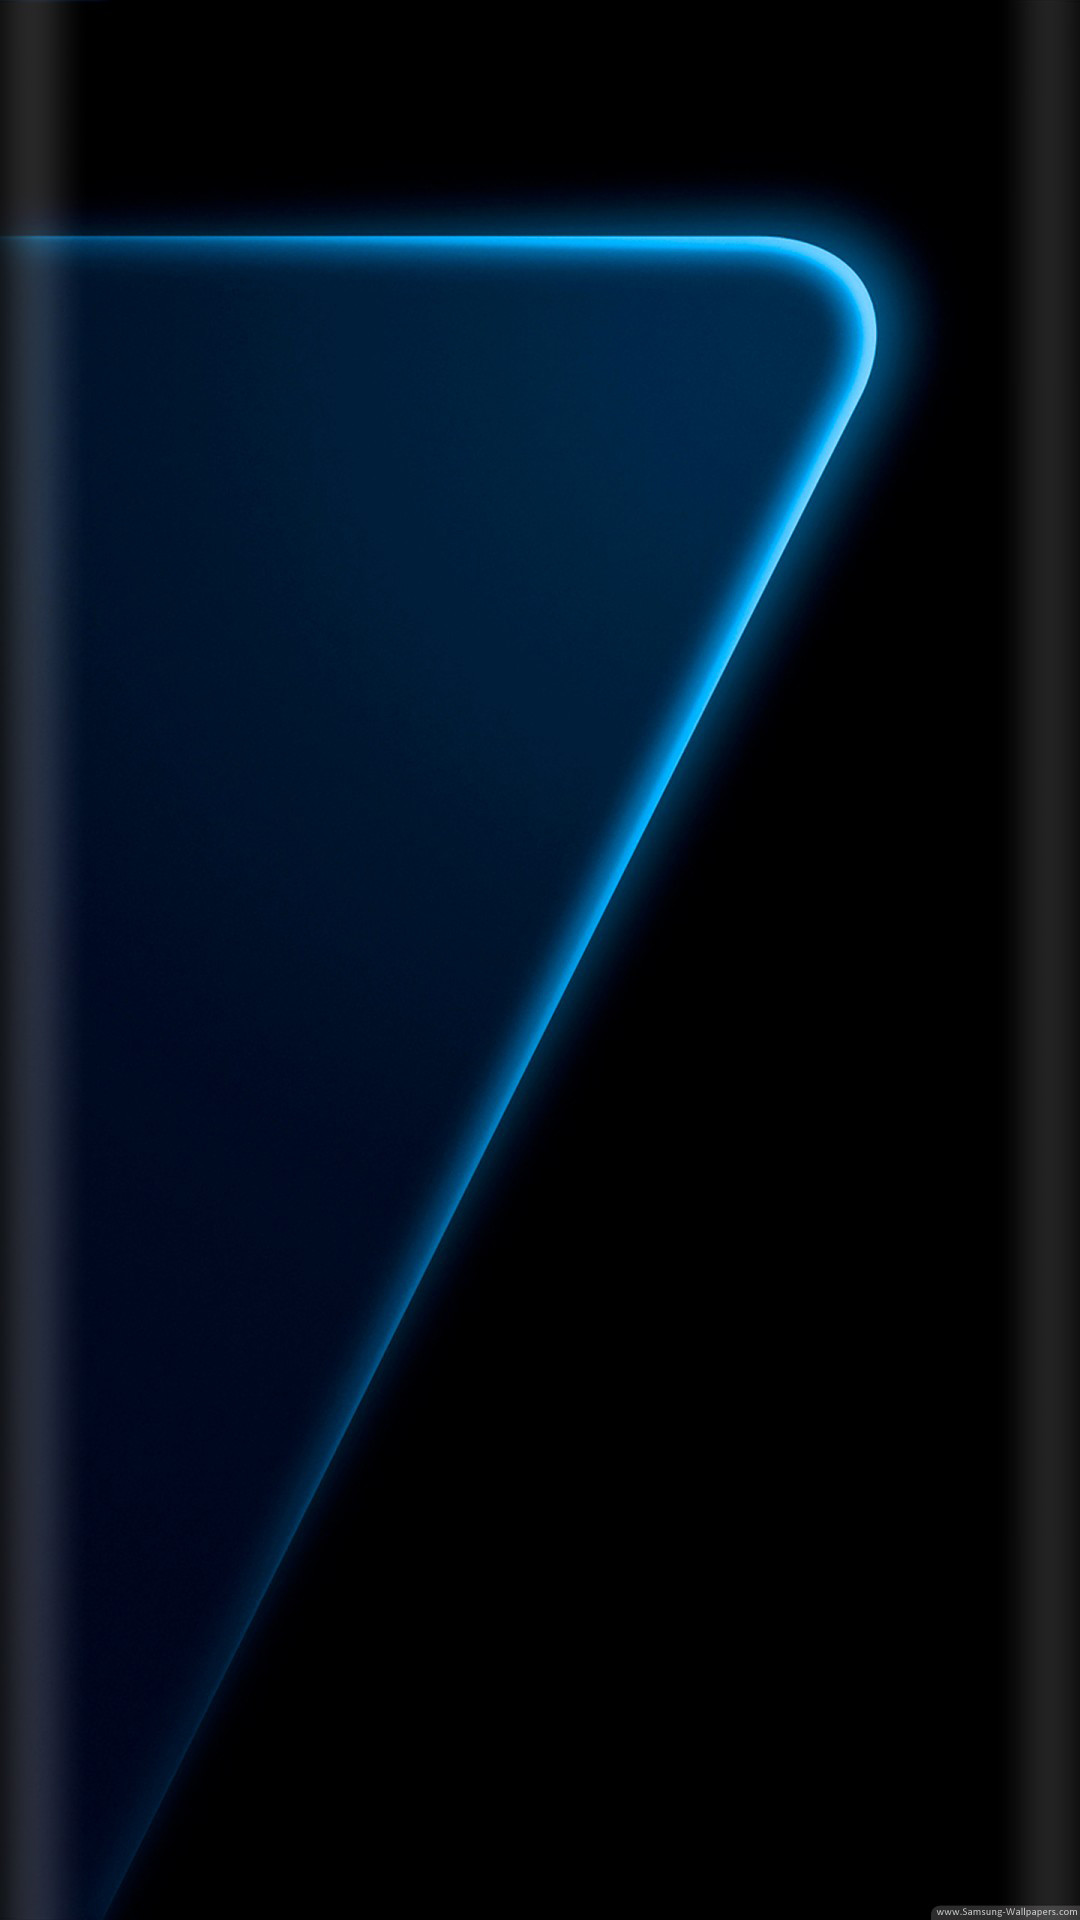 Samsung wallpaper 79 immagini - Samsung galaxy s7 wallpaper download ...